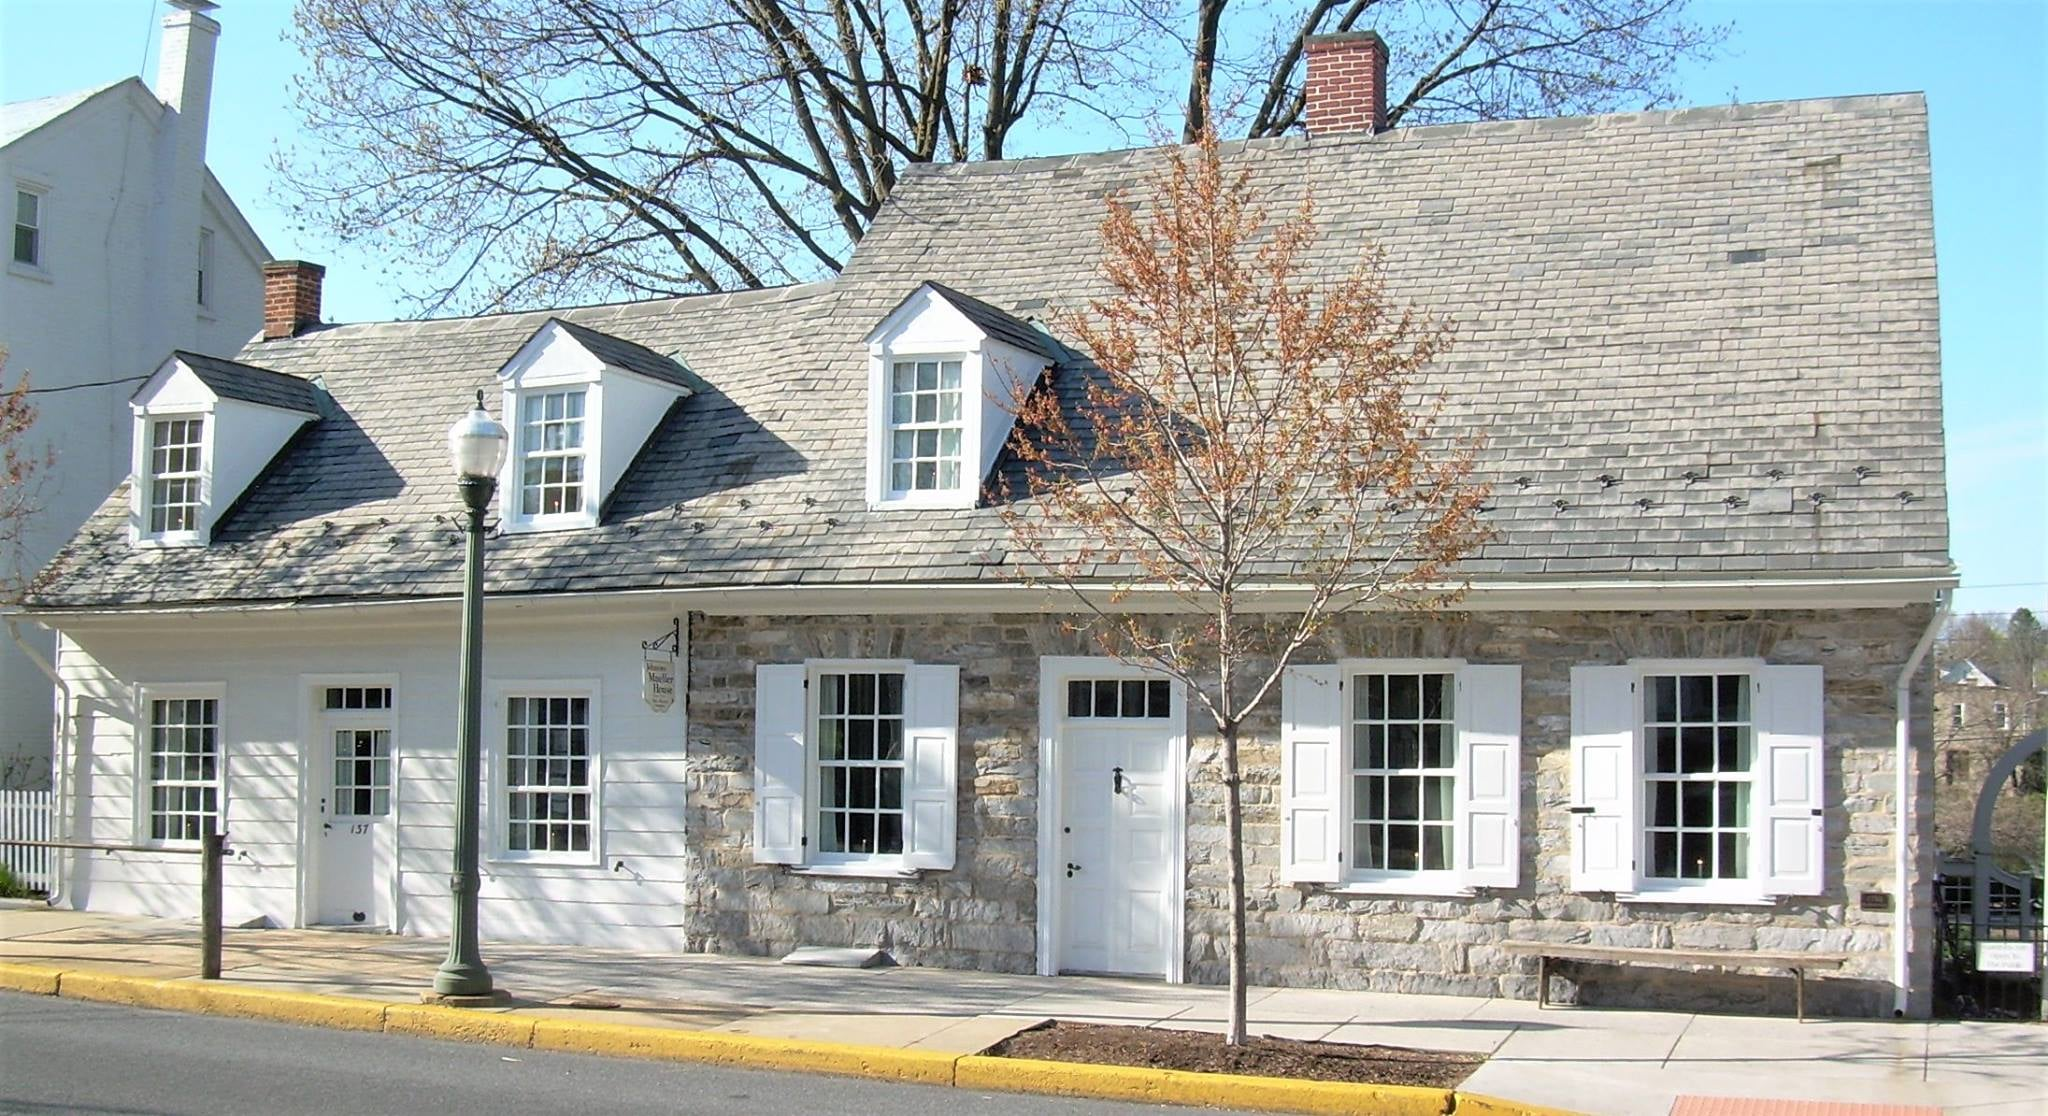 The 1792 Johannes Mueller House